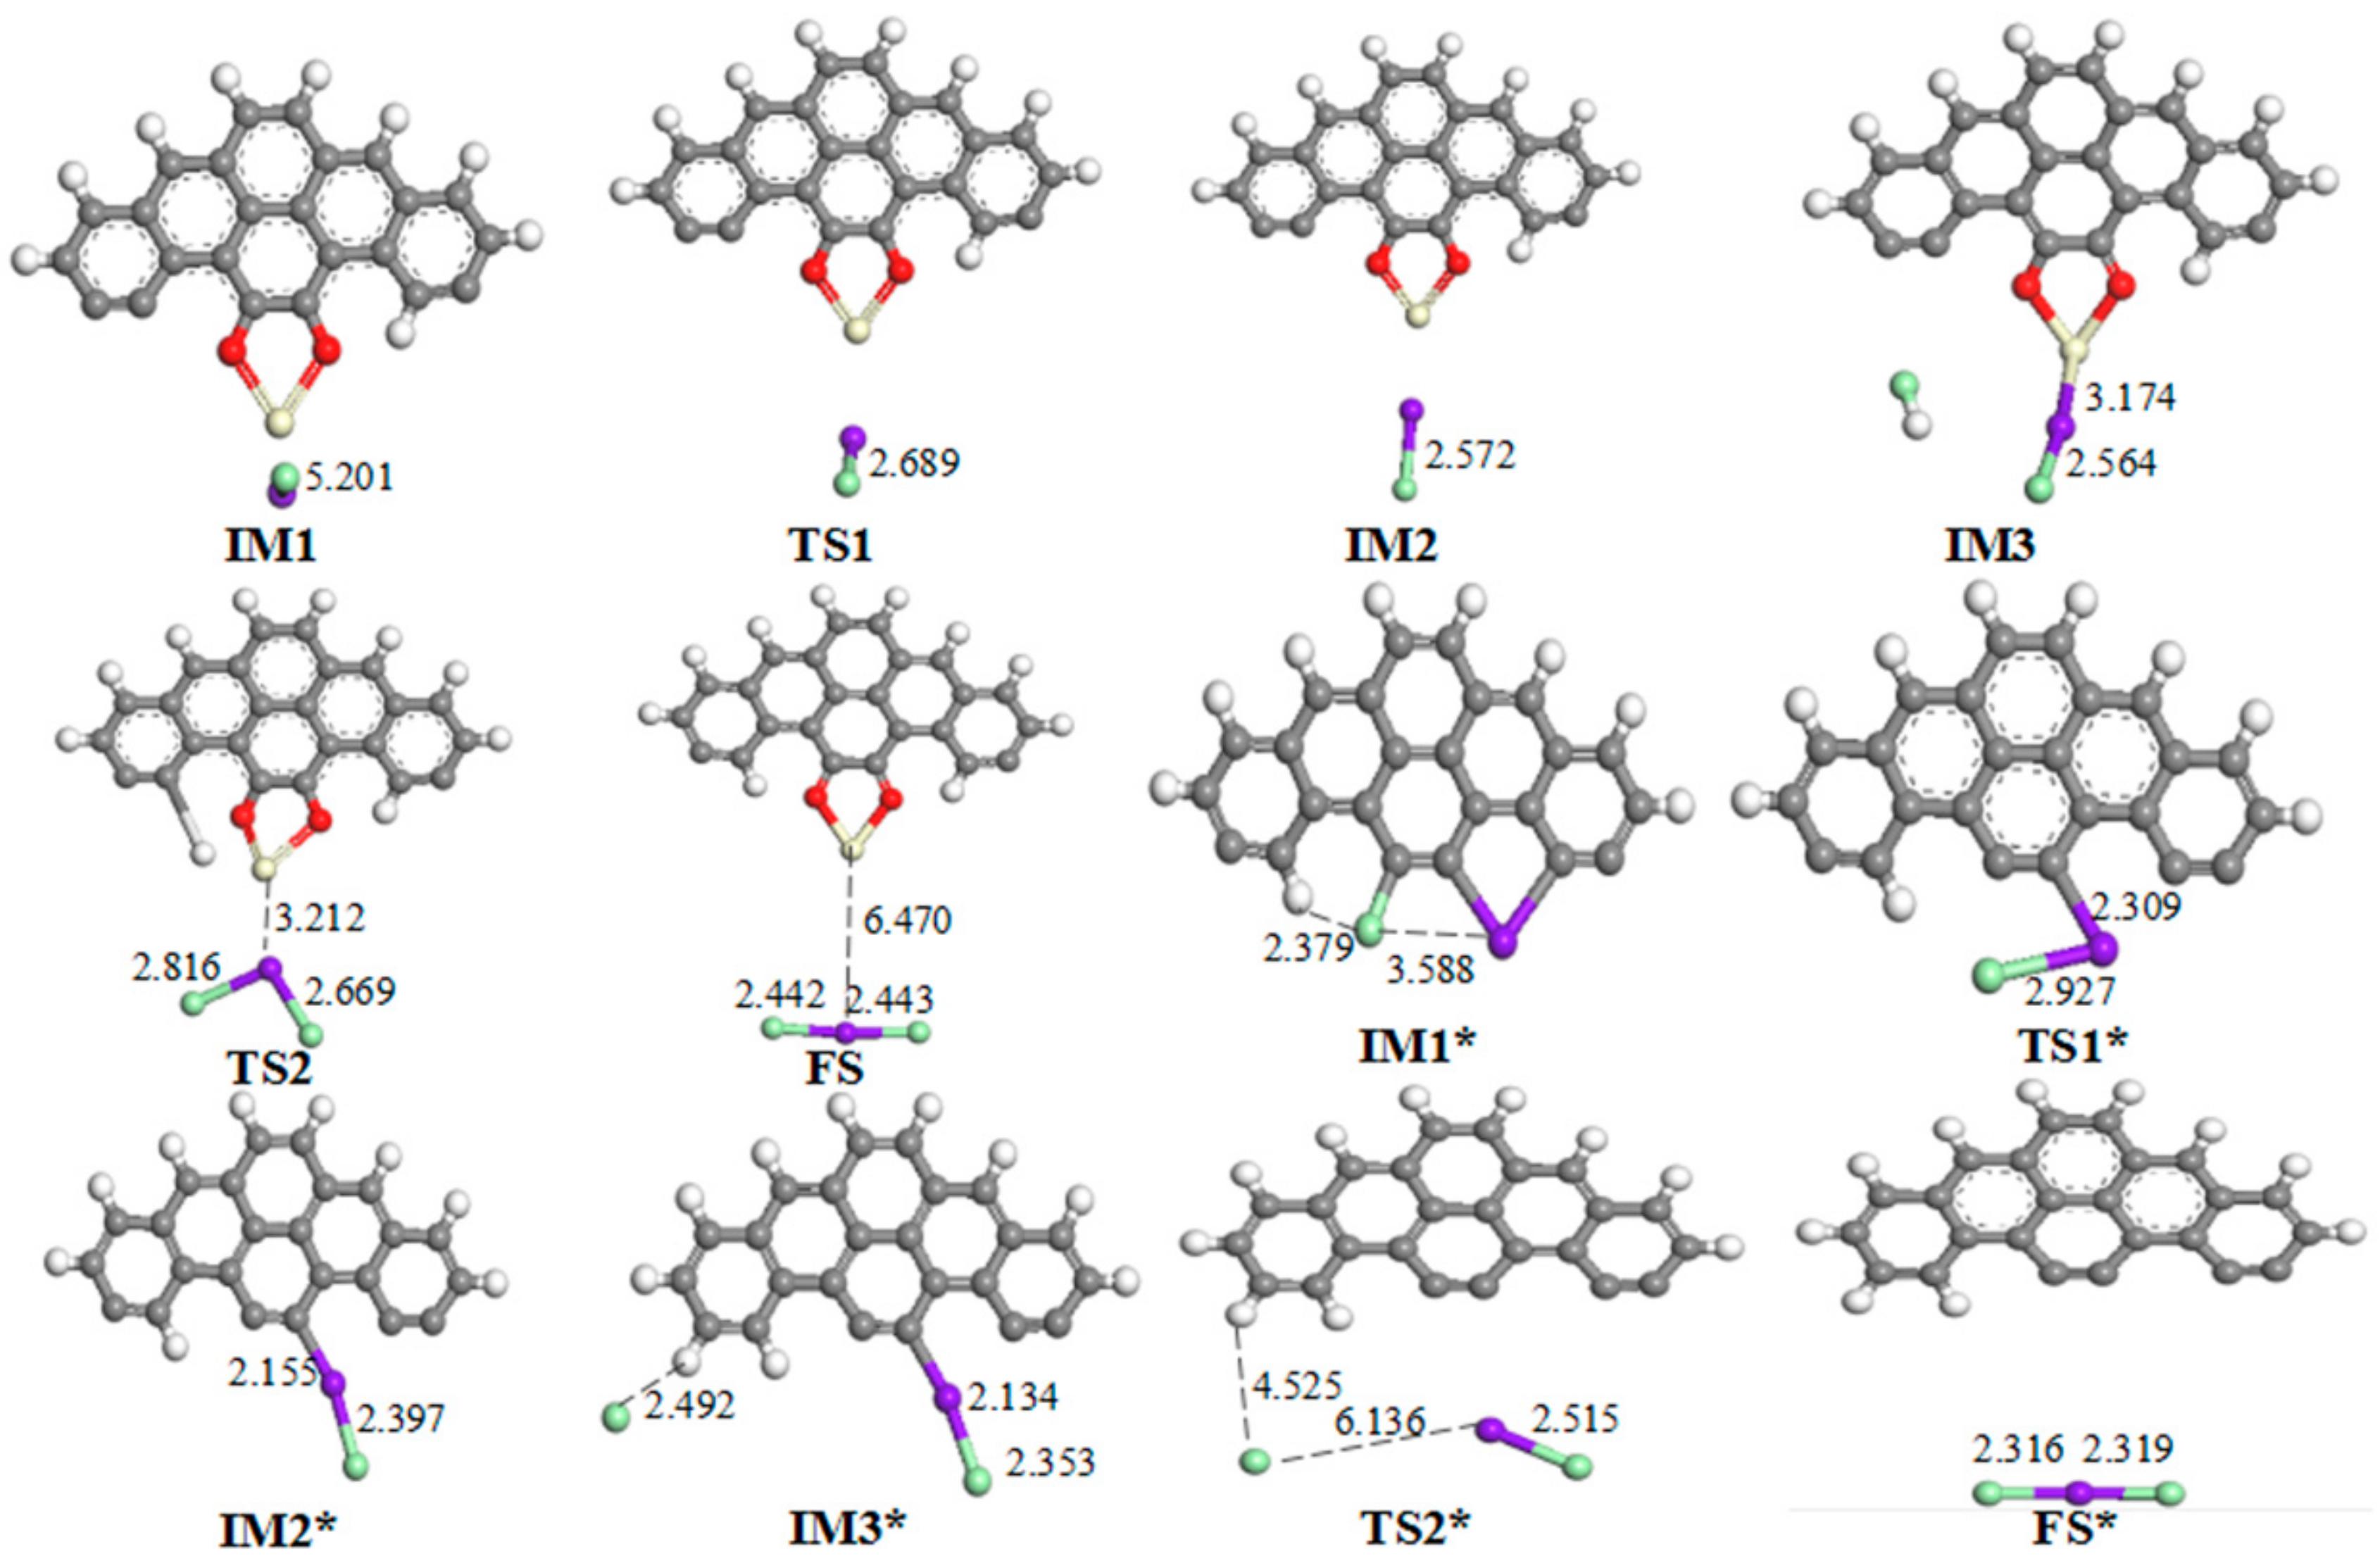 karrierenetzwe hg oxidation technology - HD3380×2220